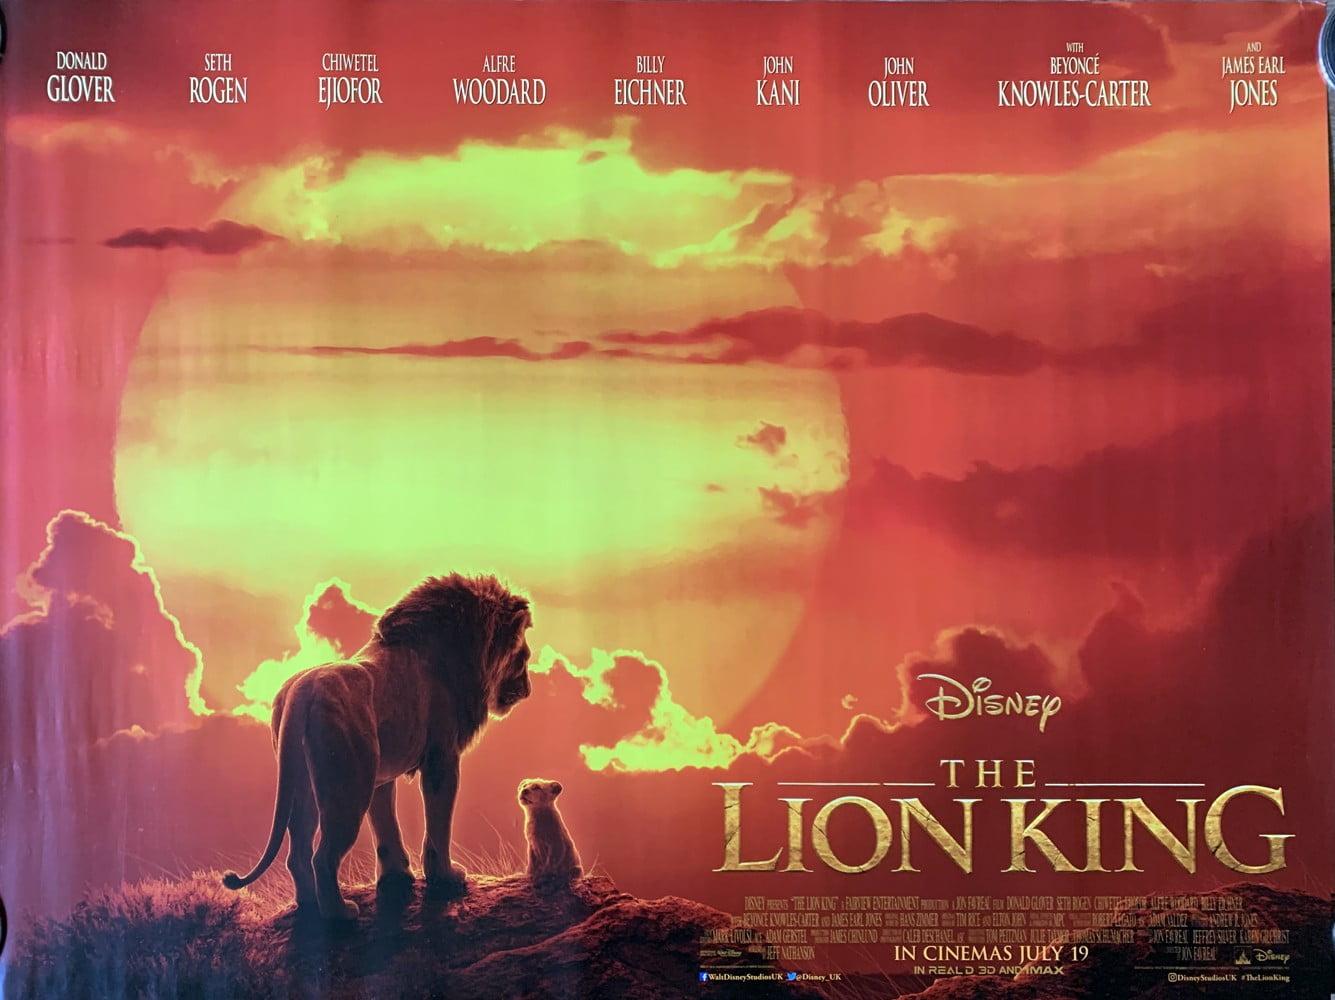 Lionking20193